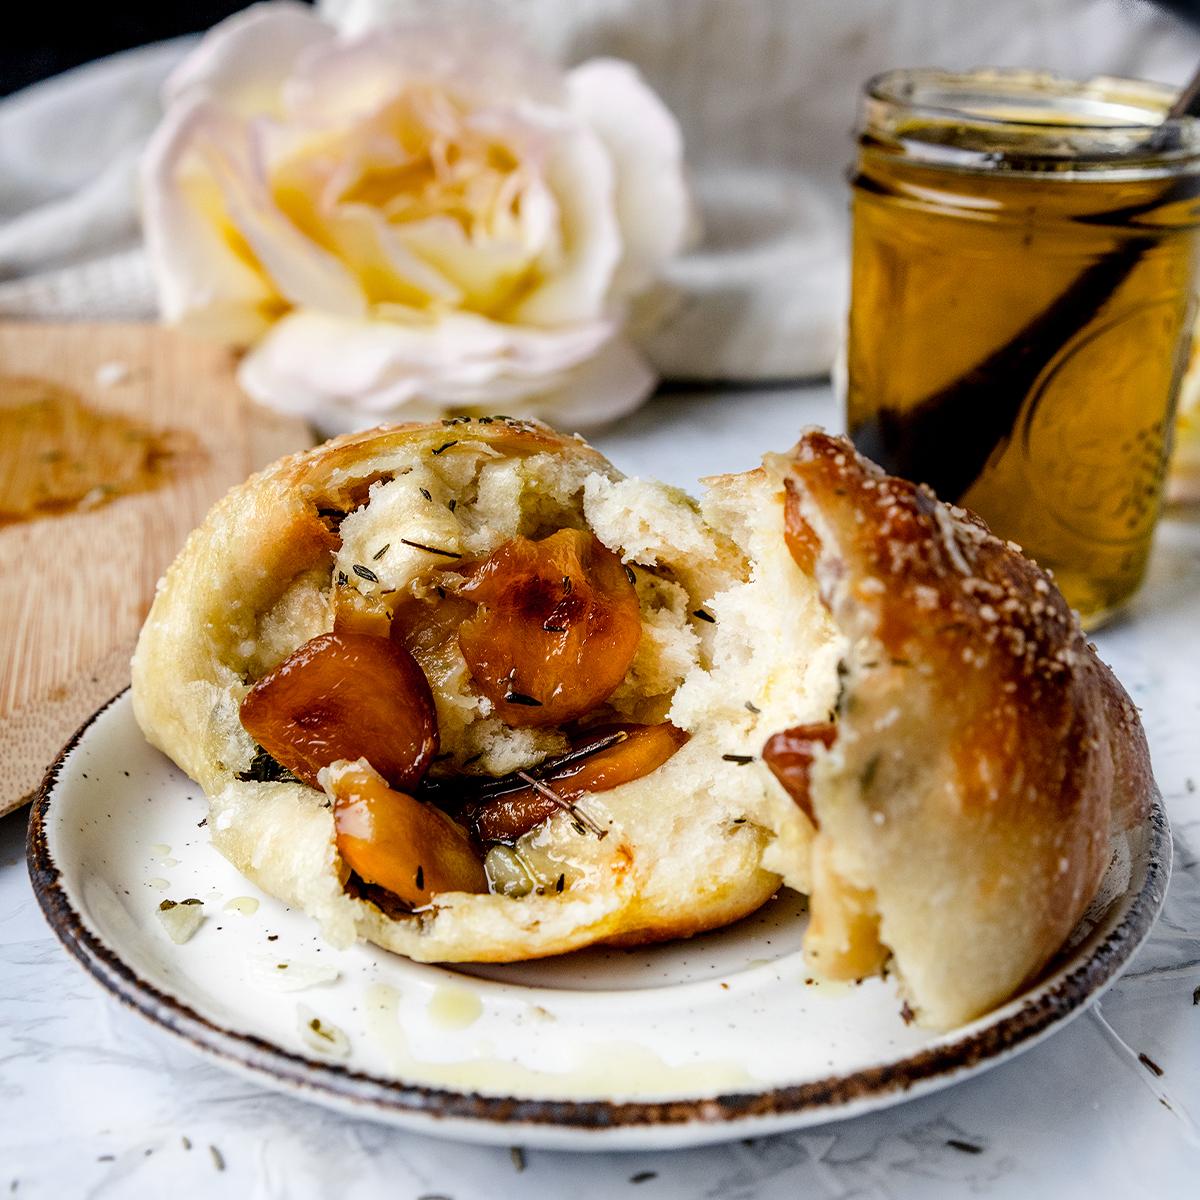 broken open garlic rolls on a white plate next to garlic olive oil in a jar